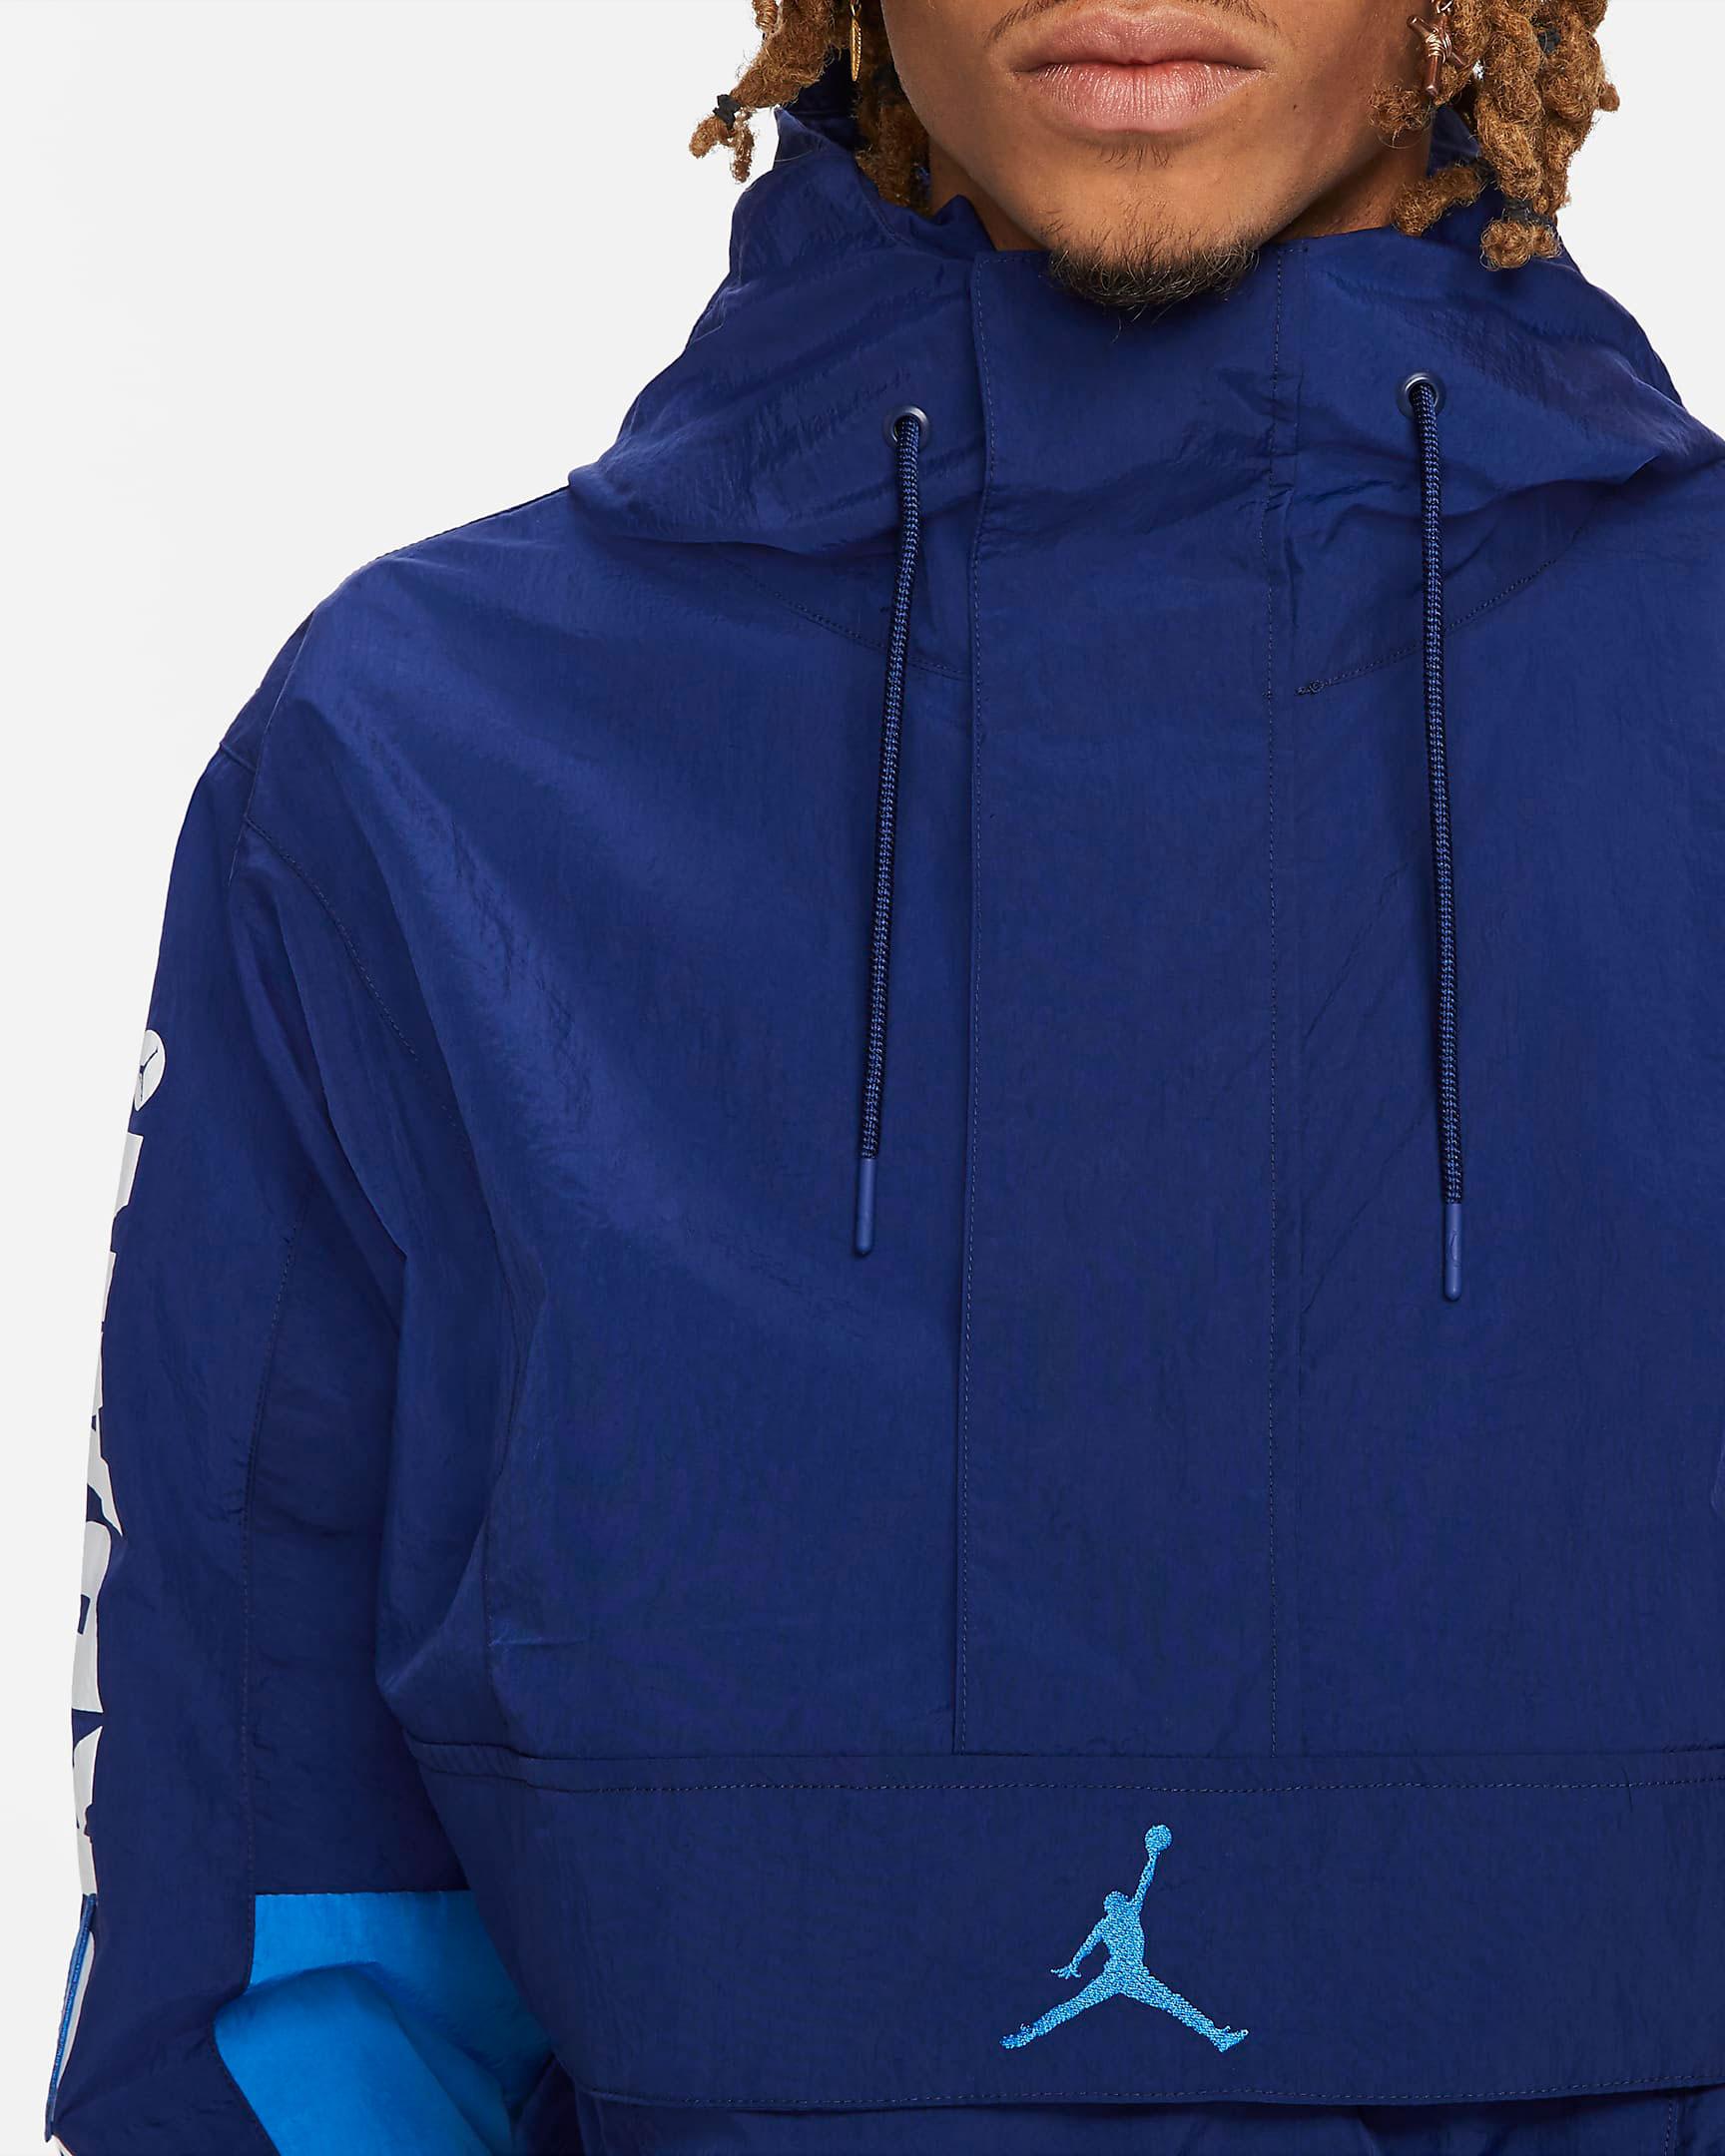 jordan-jumpman-classics-blue-jacket-spring-2021-3